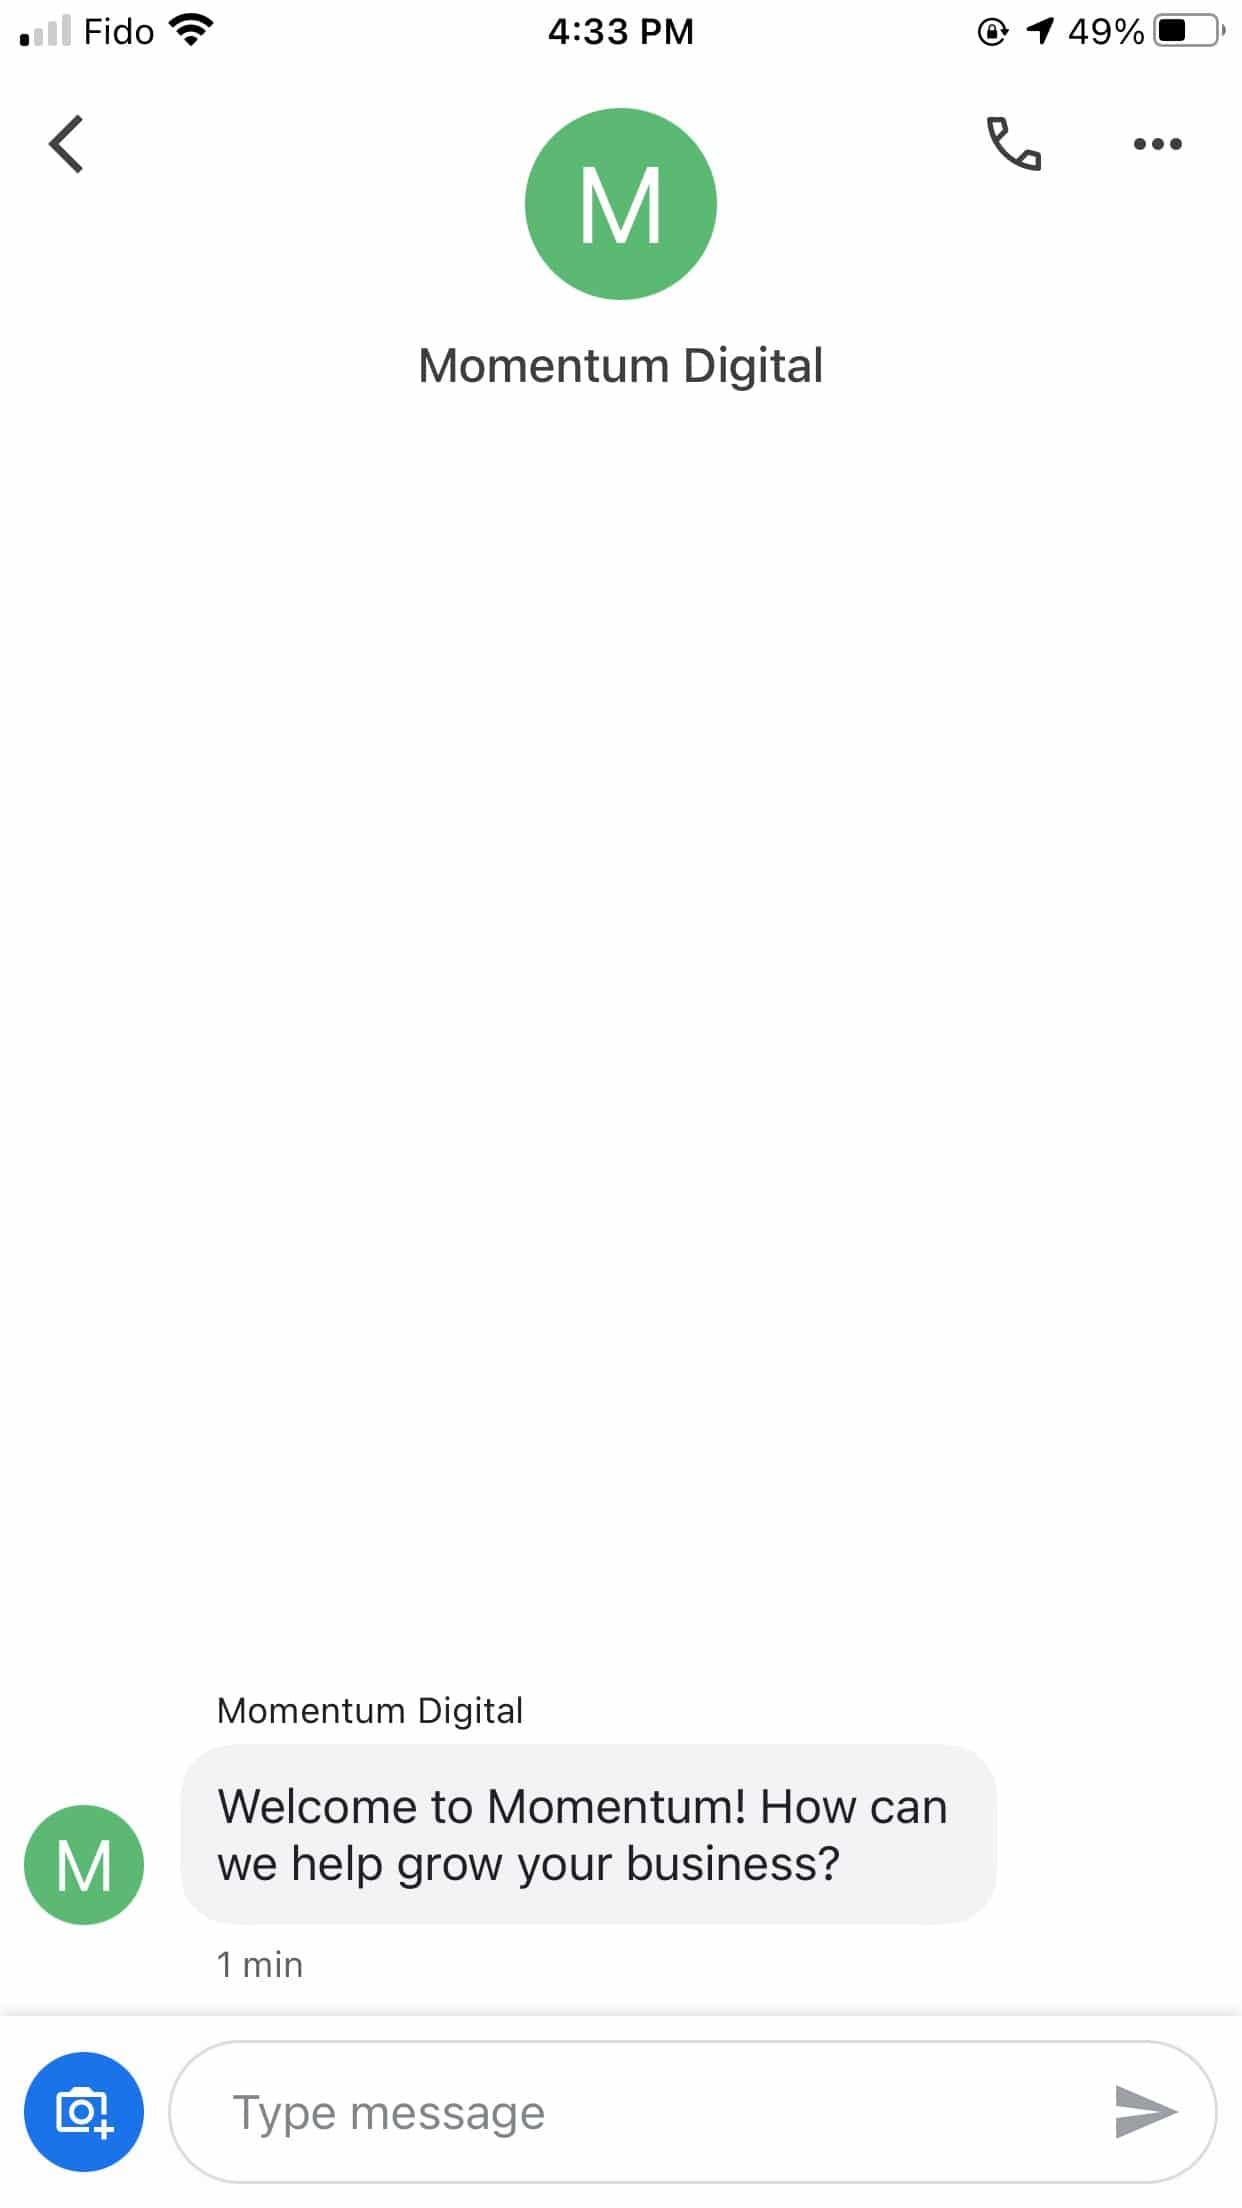 Momentum Digital welcome note